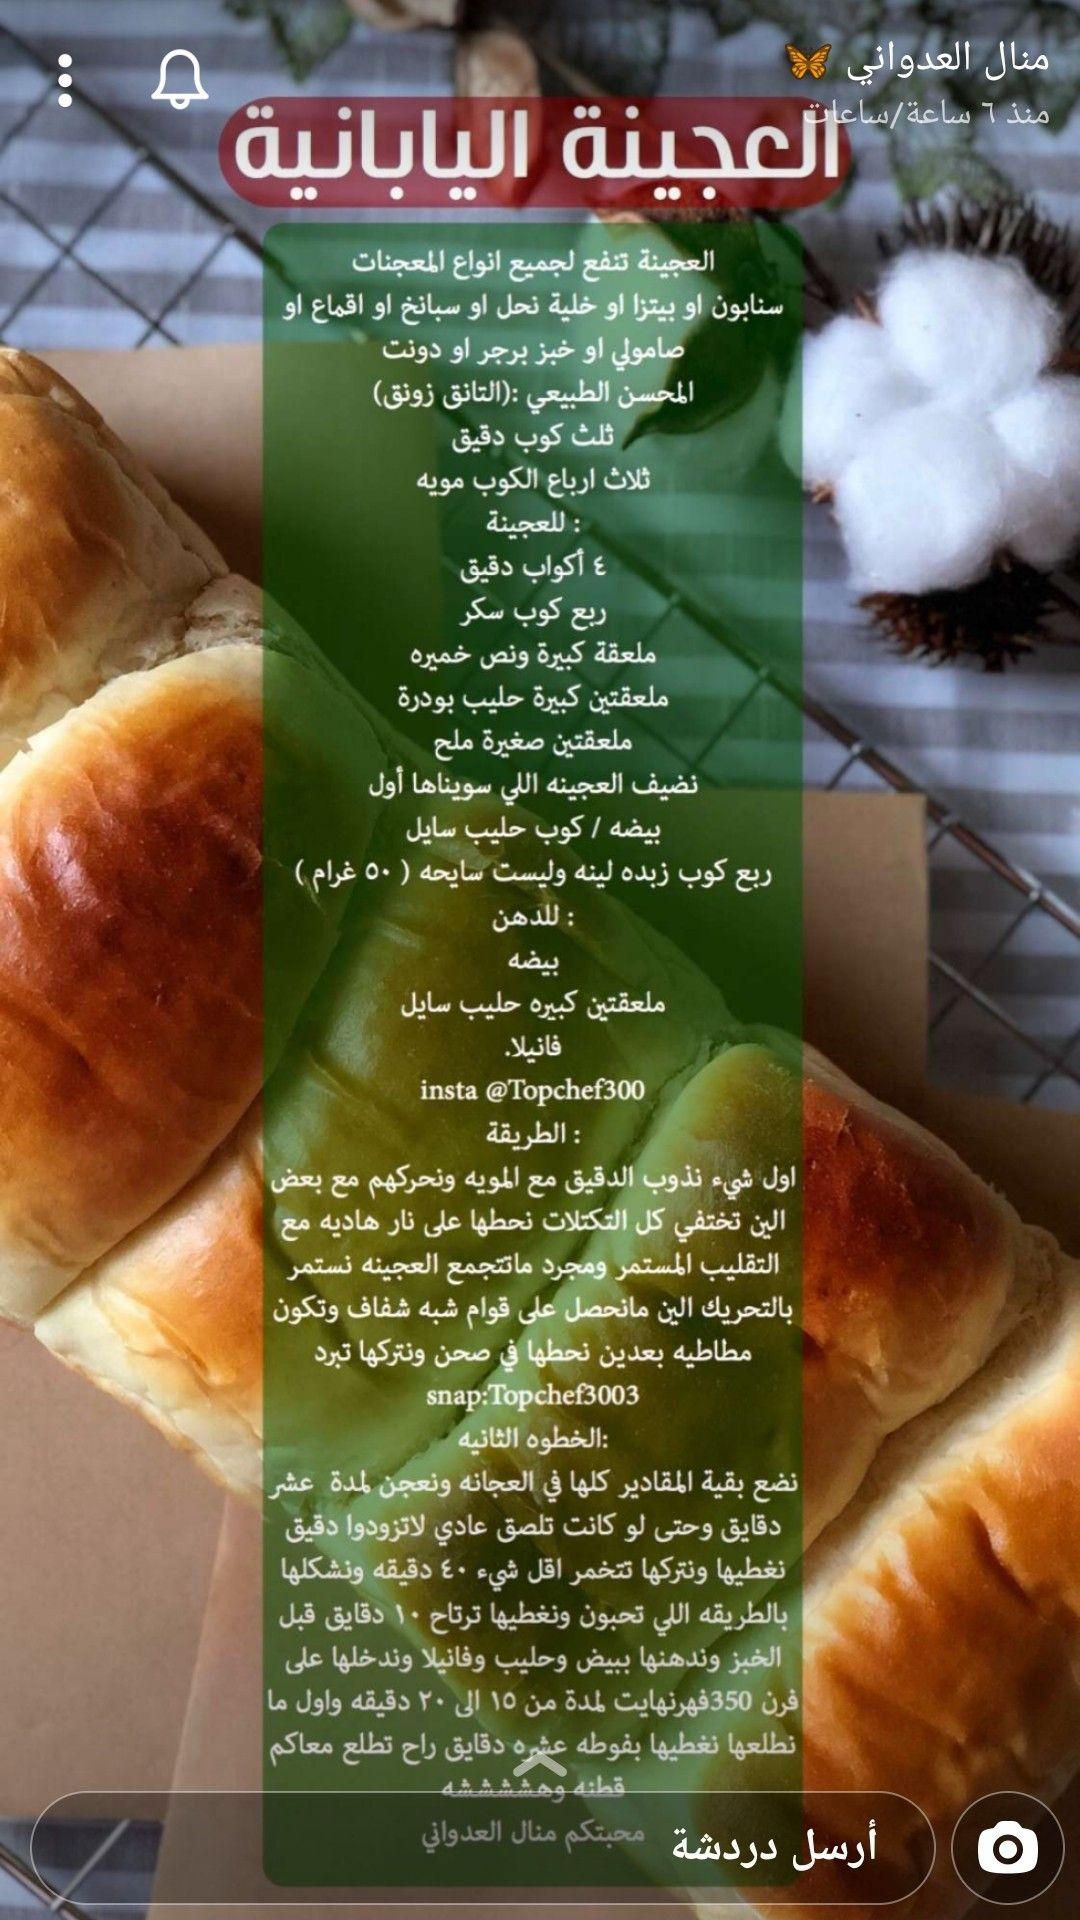 Pin By Fofo Shihri On افضل الوصفات المعتمدة للحلويات Hot Dog Buns Food Snack Recipes